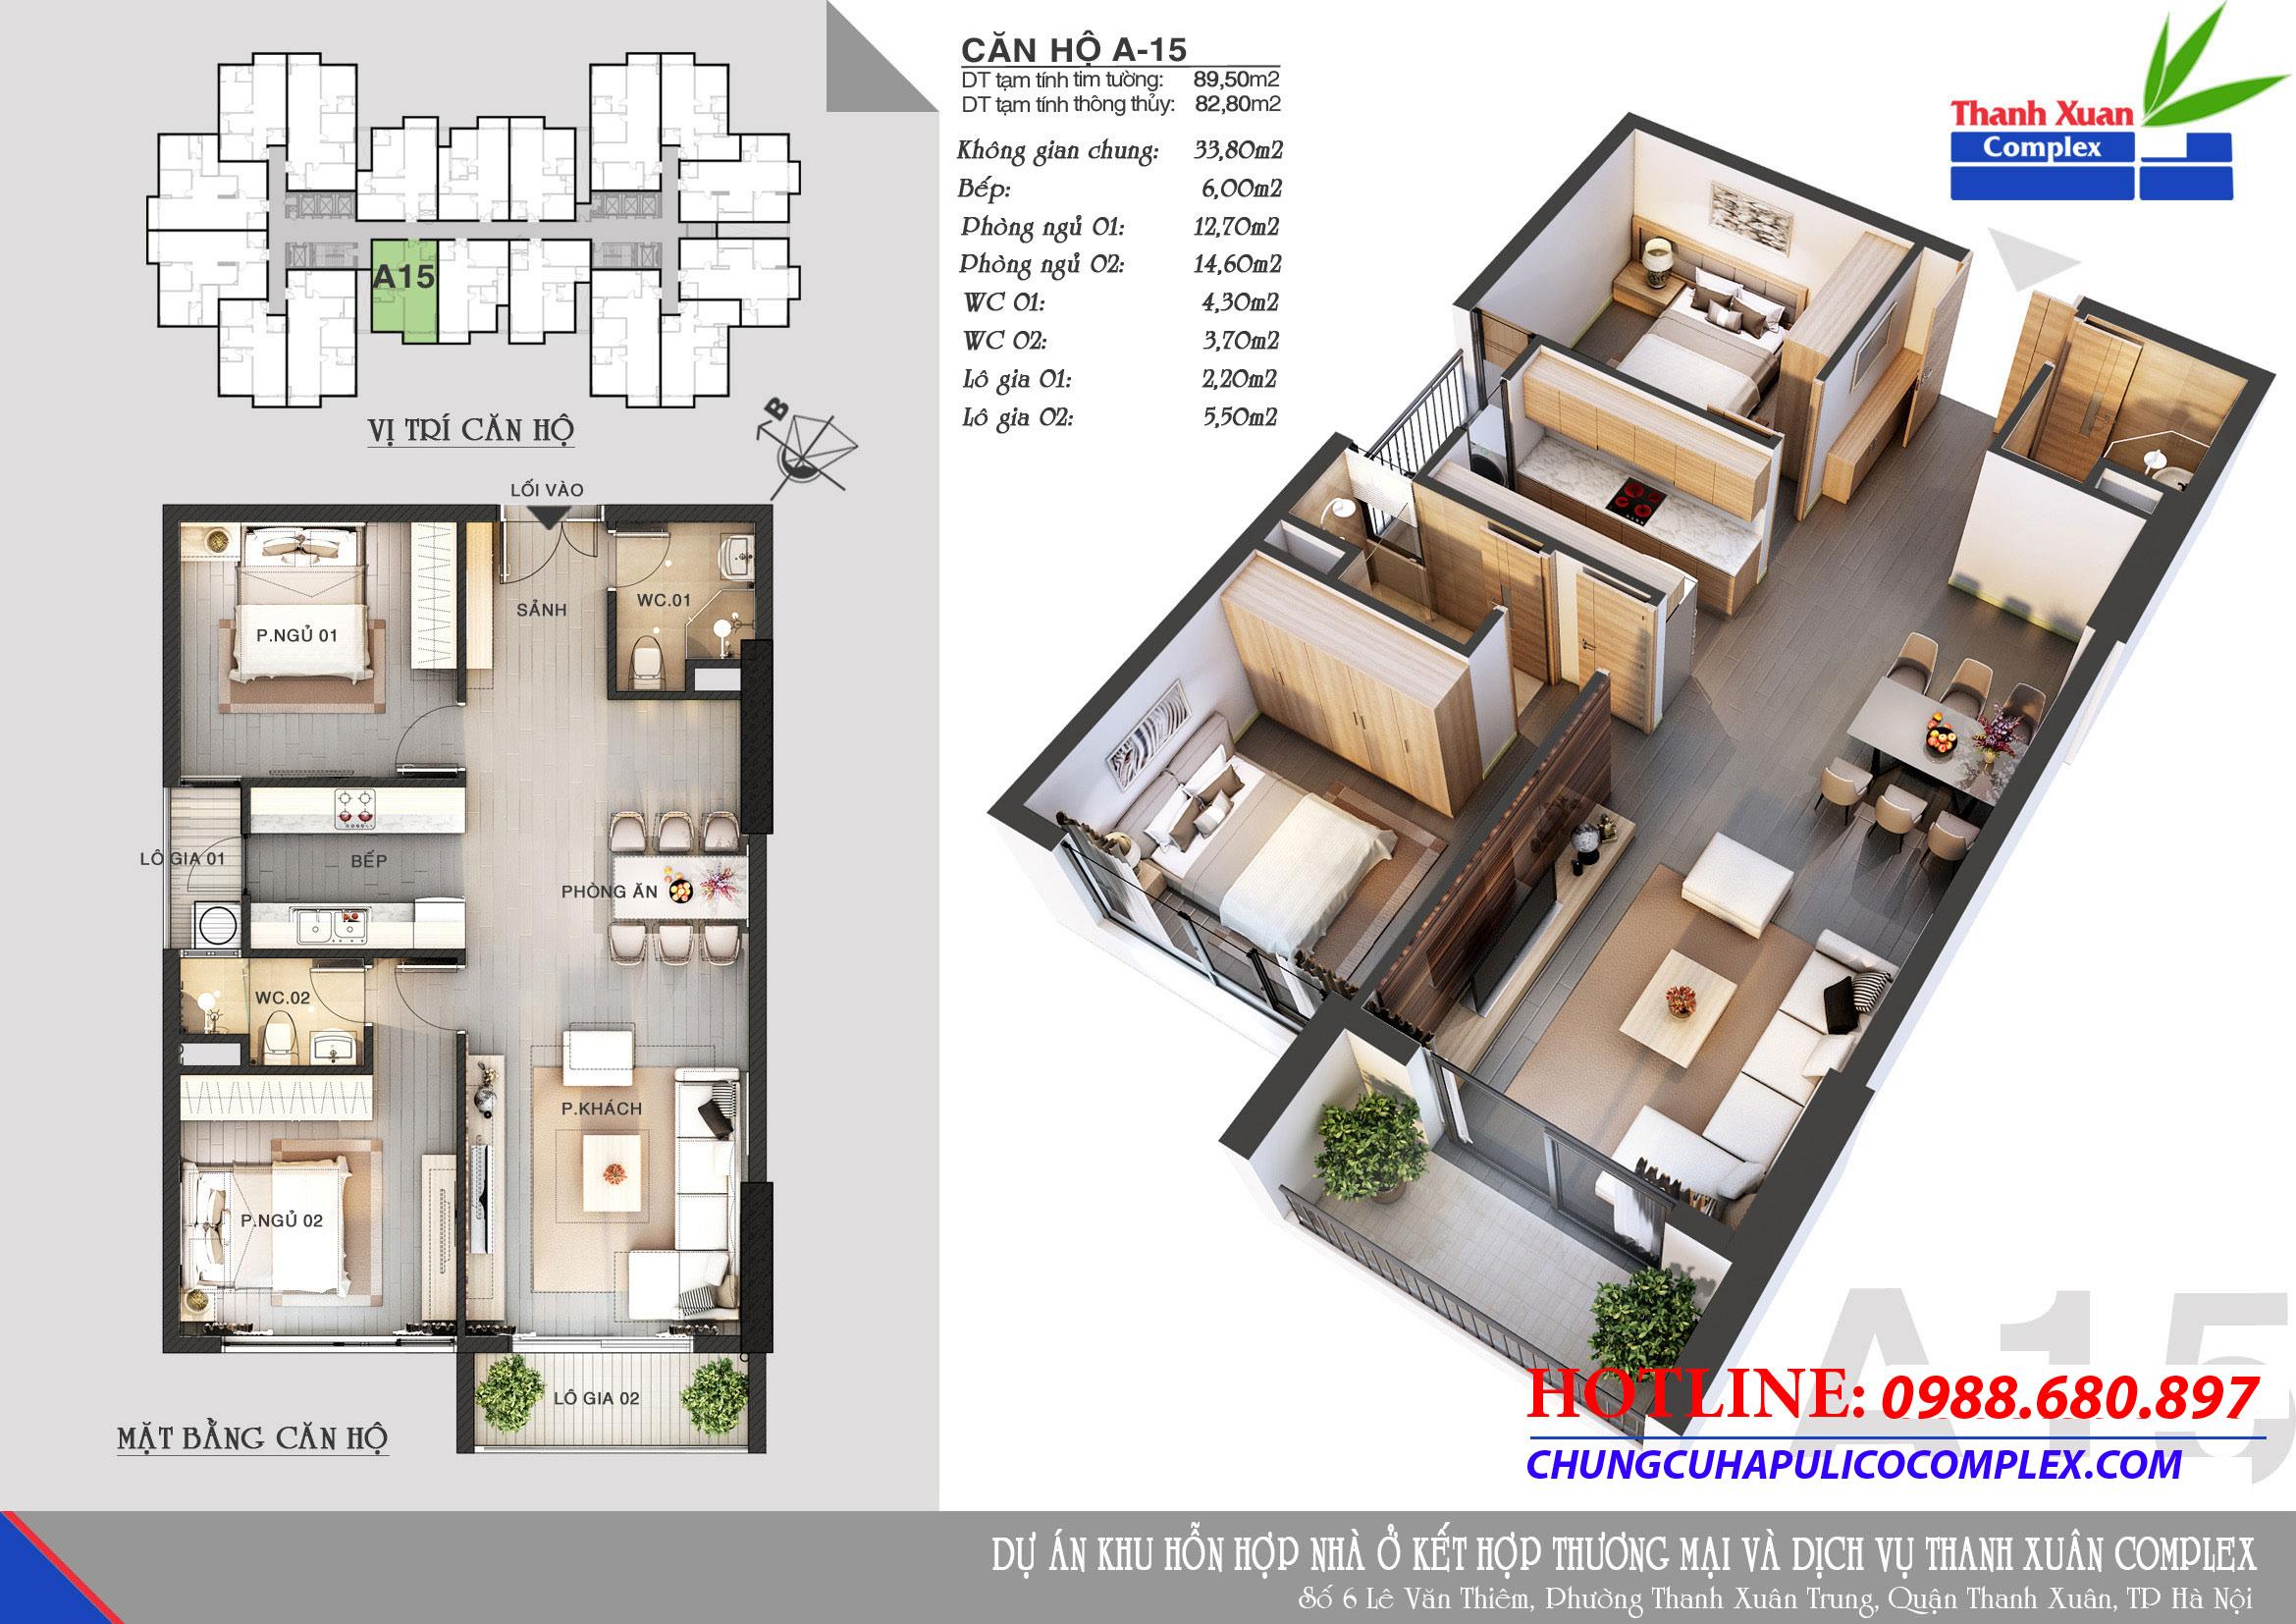 HSB_Thanhxuan-complex_CH-A15_suachotT42016-copy